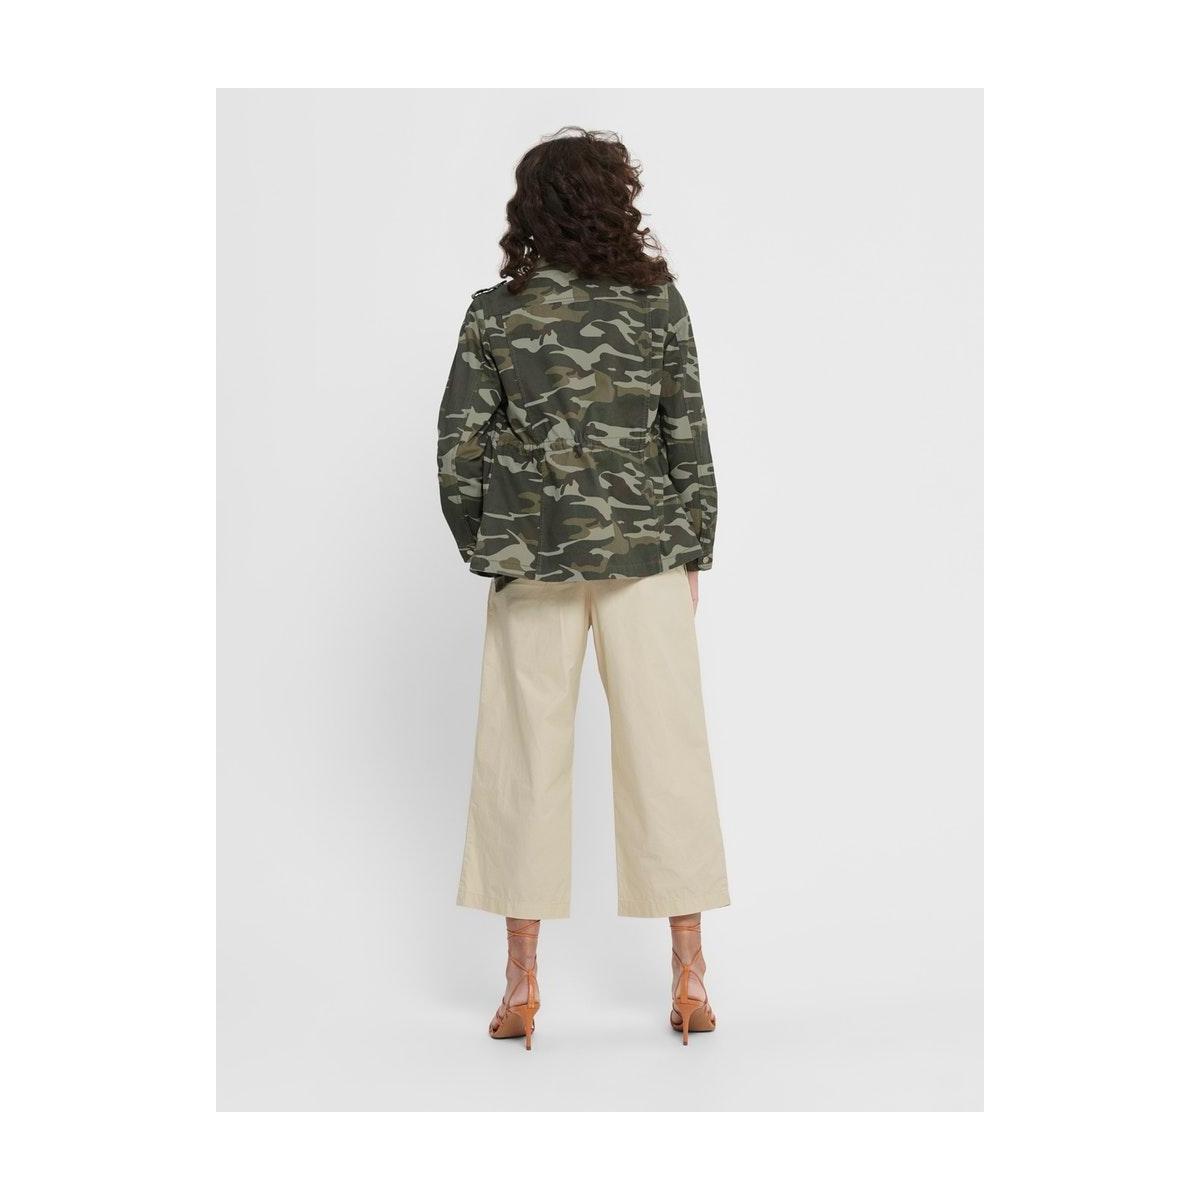 onlohio utility jacket cc otw 15192278 only jas black olive/camo